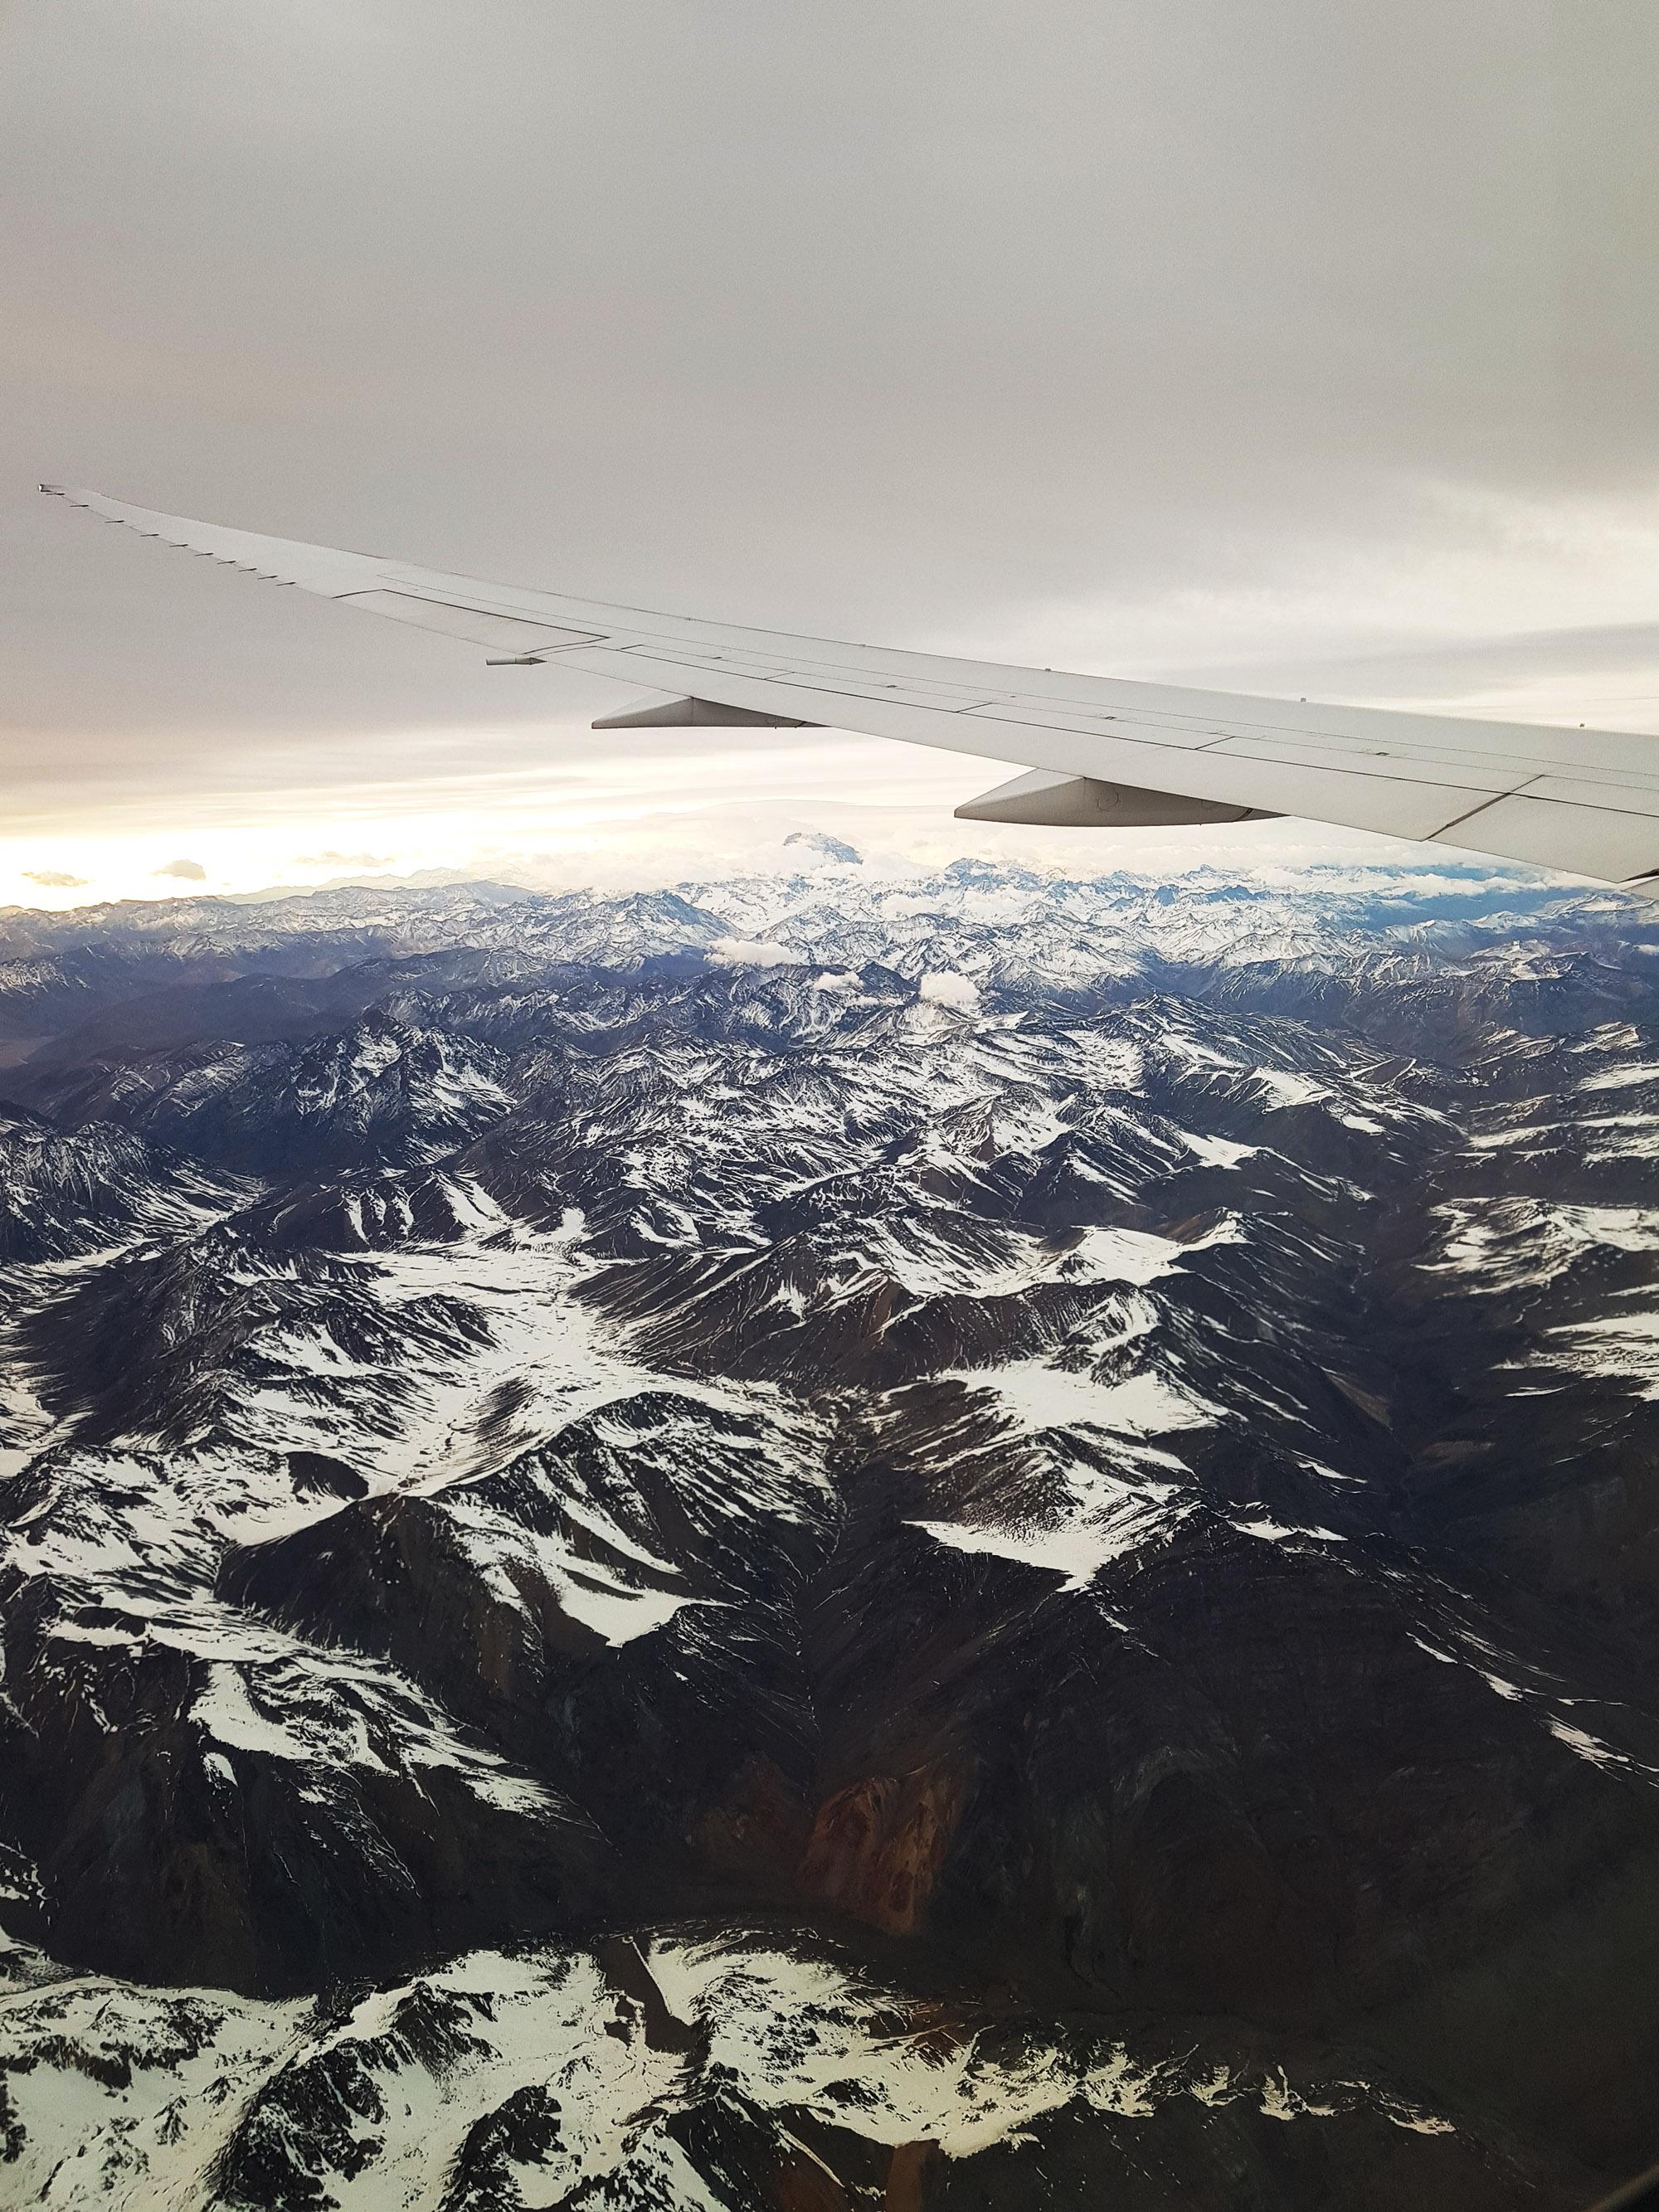 Im Morgengrauen kurz vor der Landung die Cordillera de la Costa